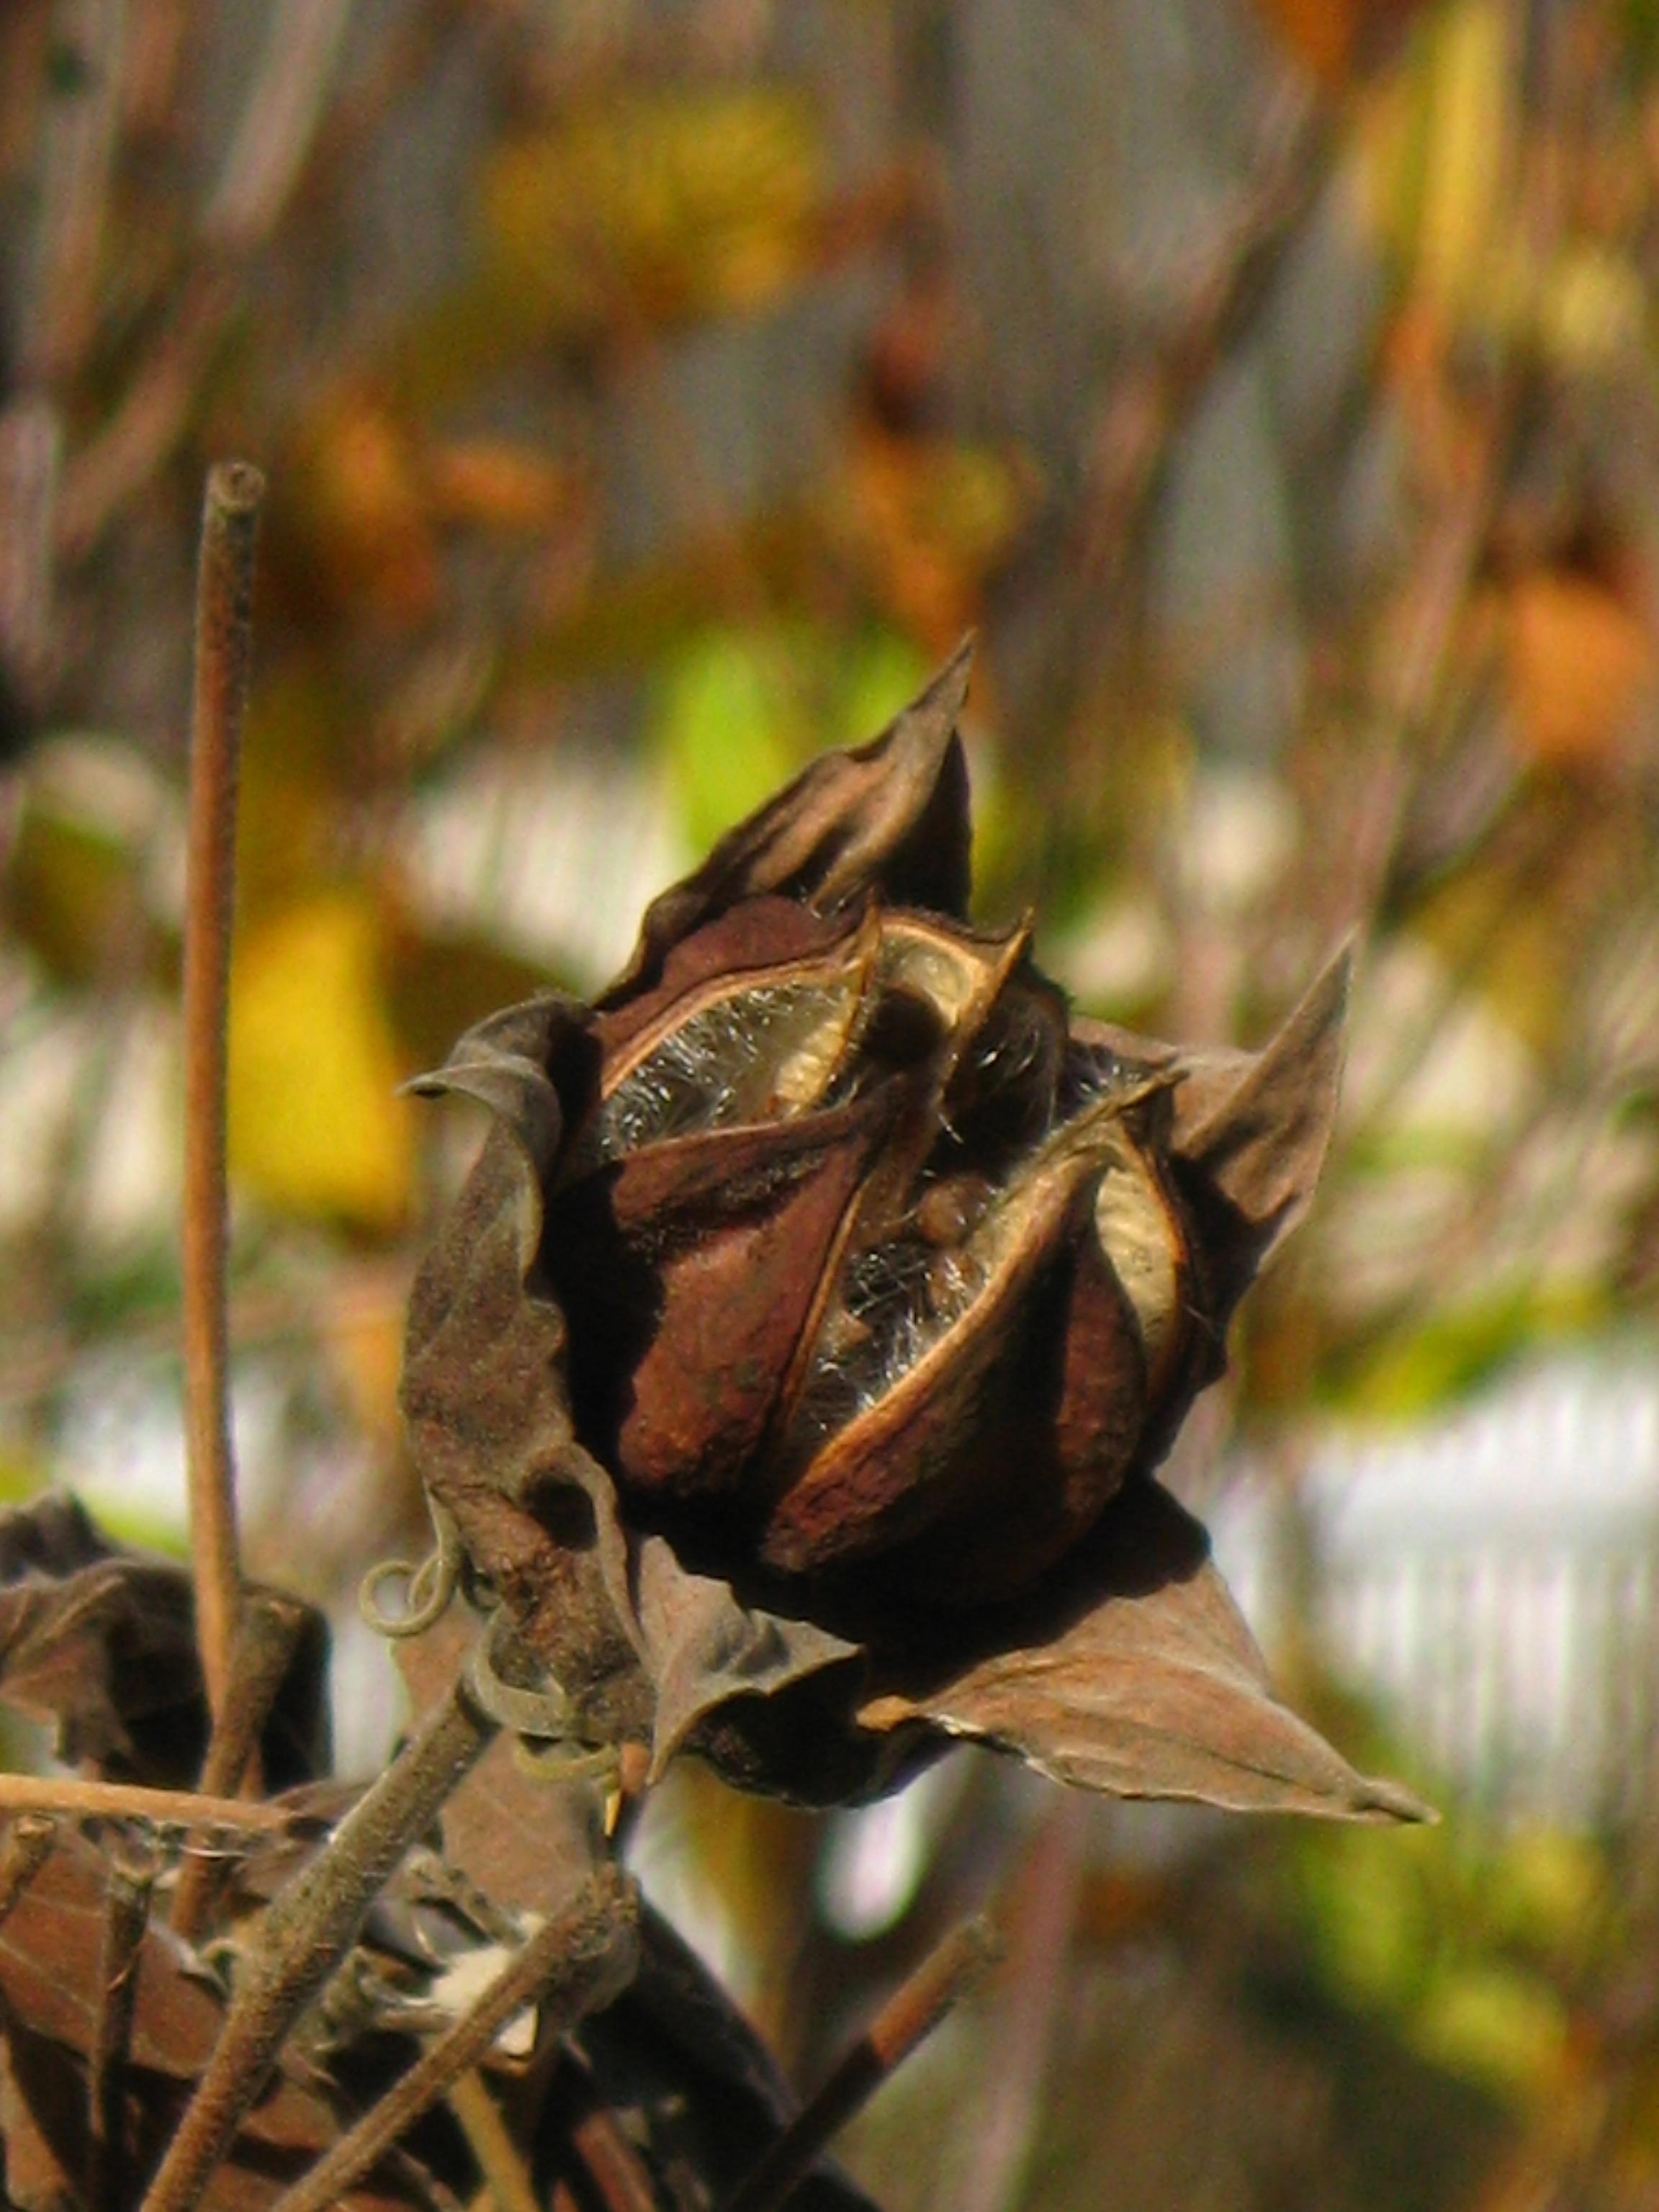 Faint Memories of My Garden | Gardens Eye View